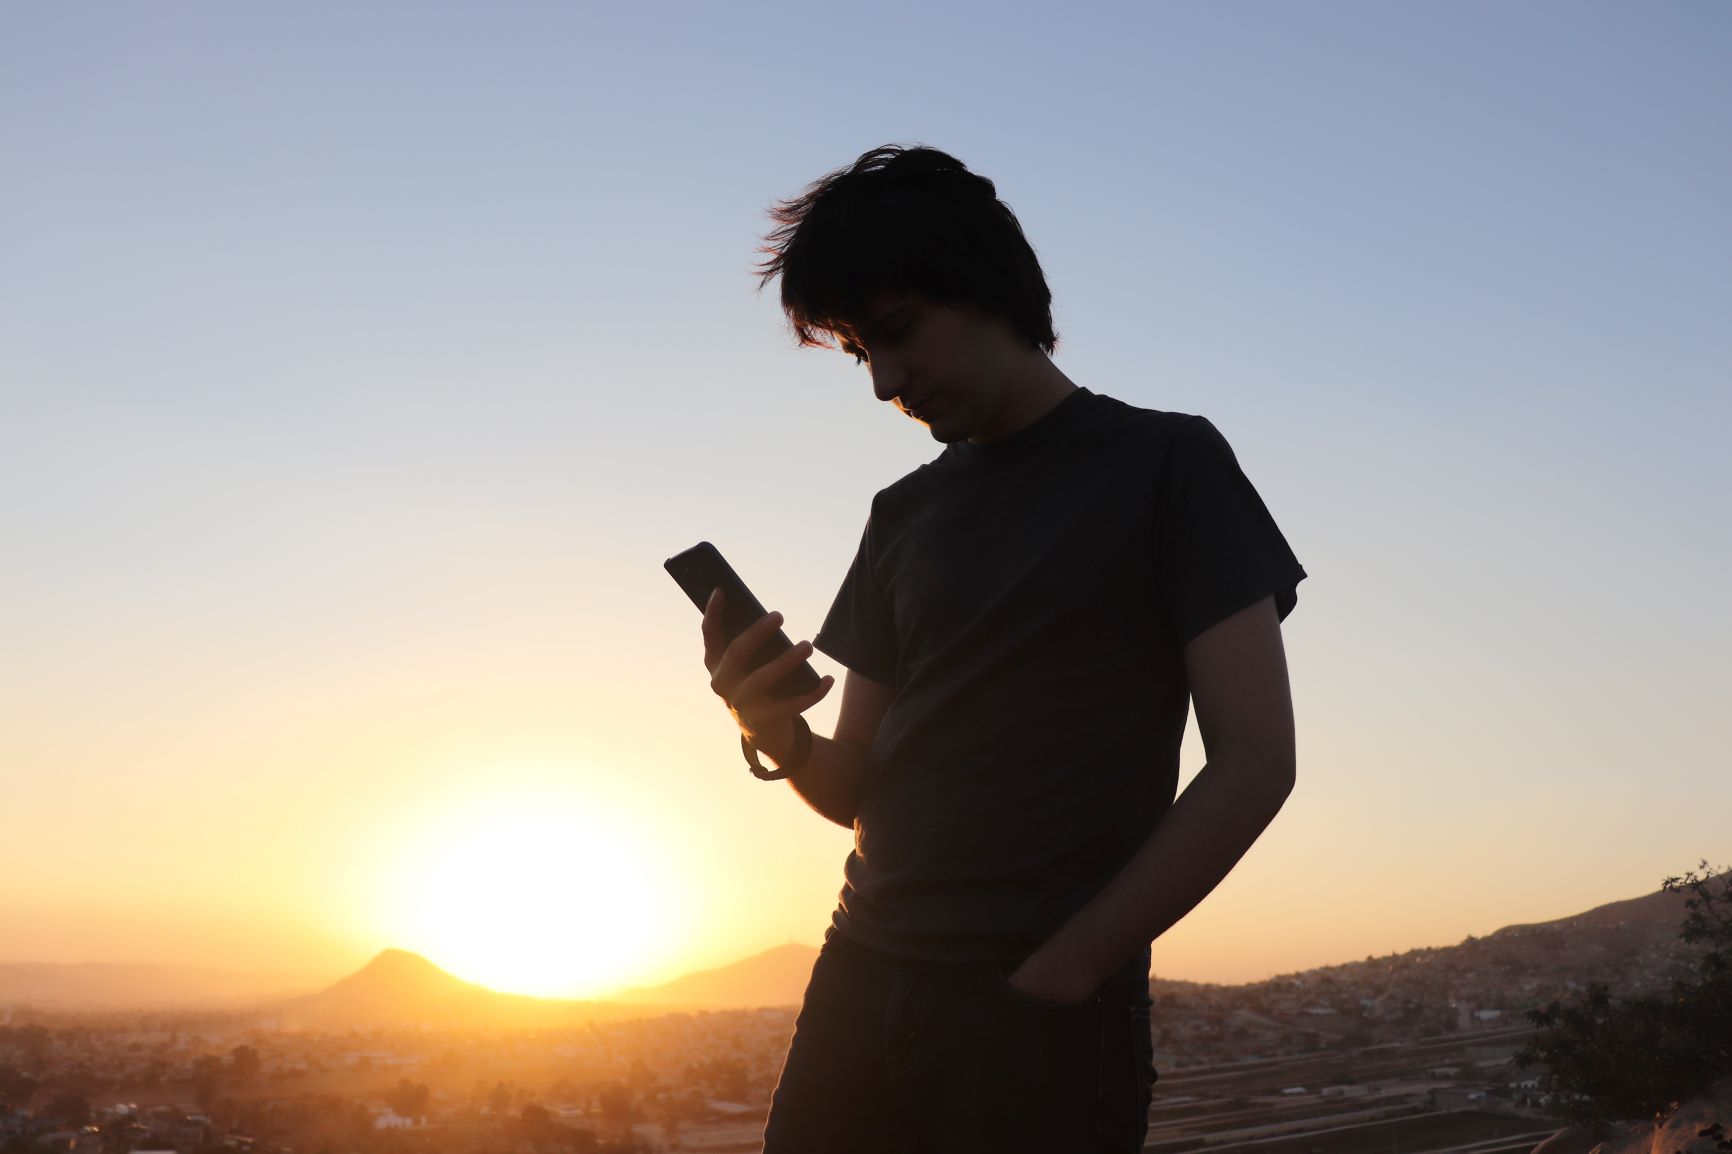 Man checking intercom notification on phone